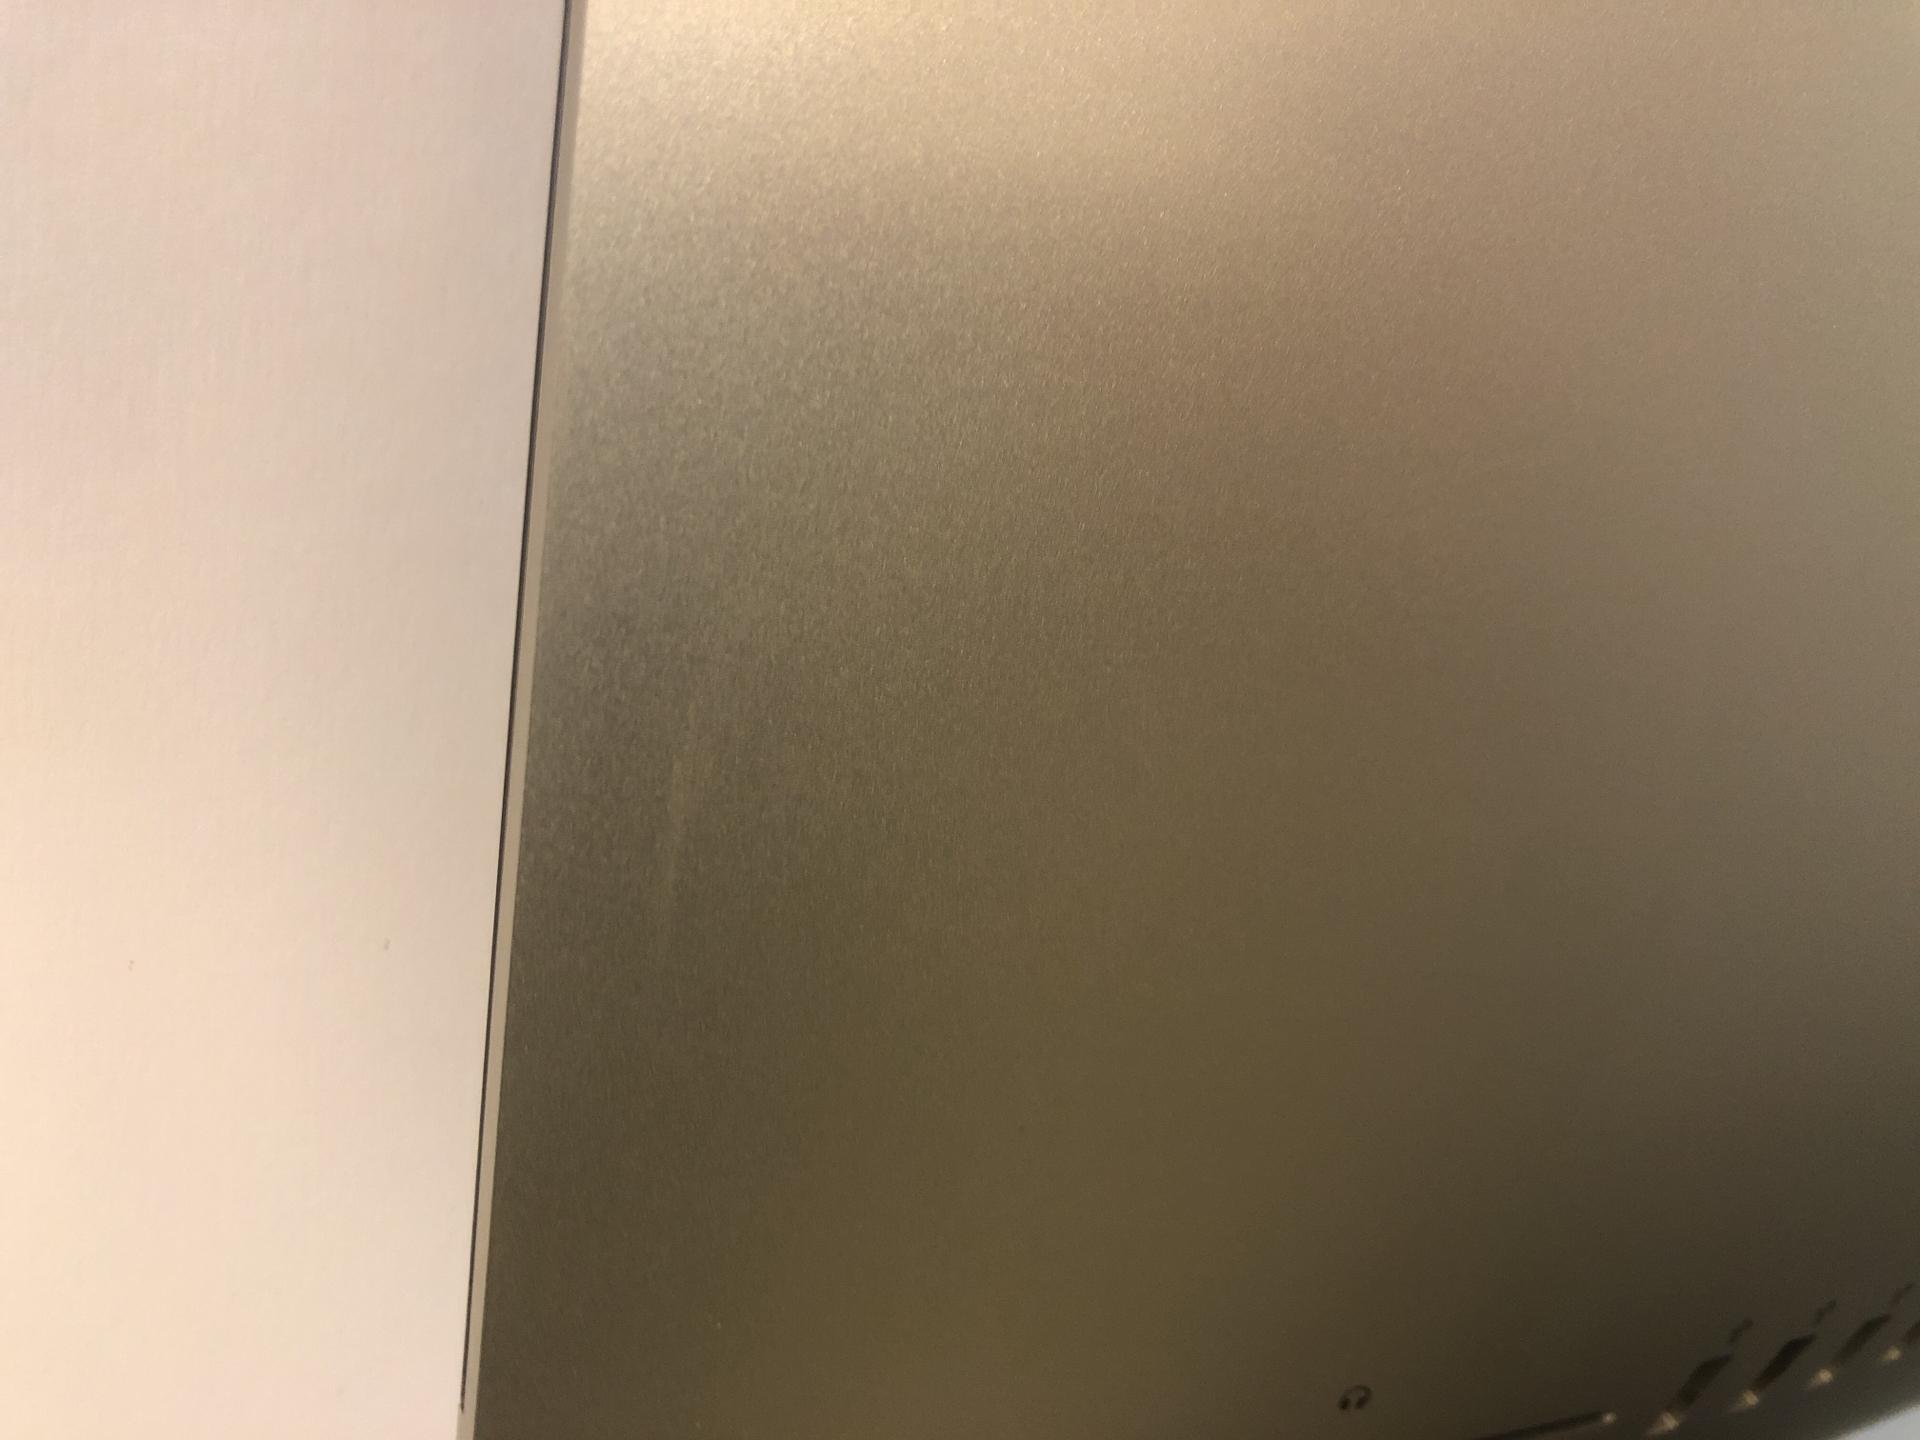 "iMac 27"" Retina 5K Late 2014 (Intel Quad-Core i7 4.0 GHz 32 GB RAM 3 TB Fusion Drive), Intel Quad-Core i7 4.0 GHz, 32 GB RAM, 3 TB Fusion Drive, image 3"